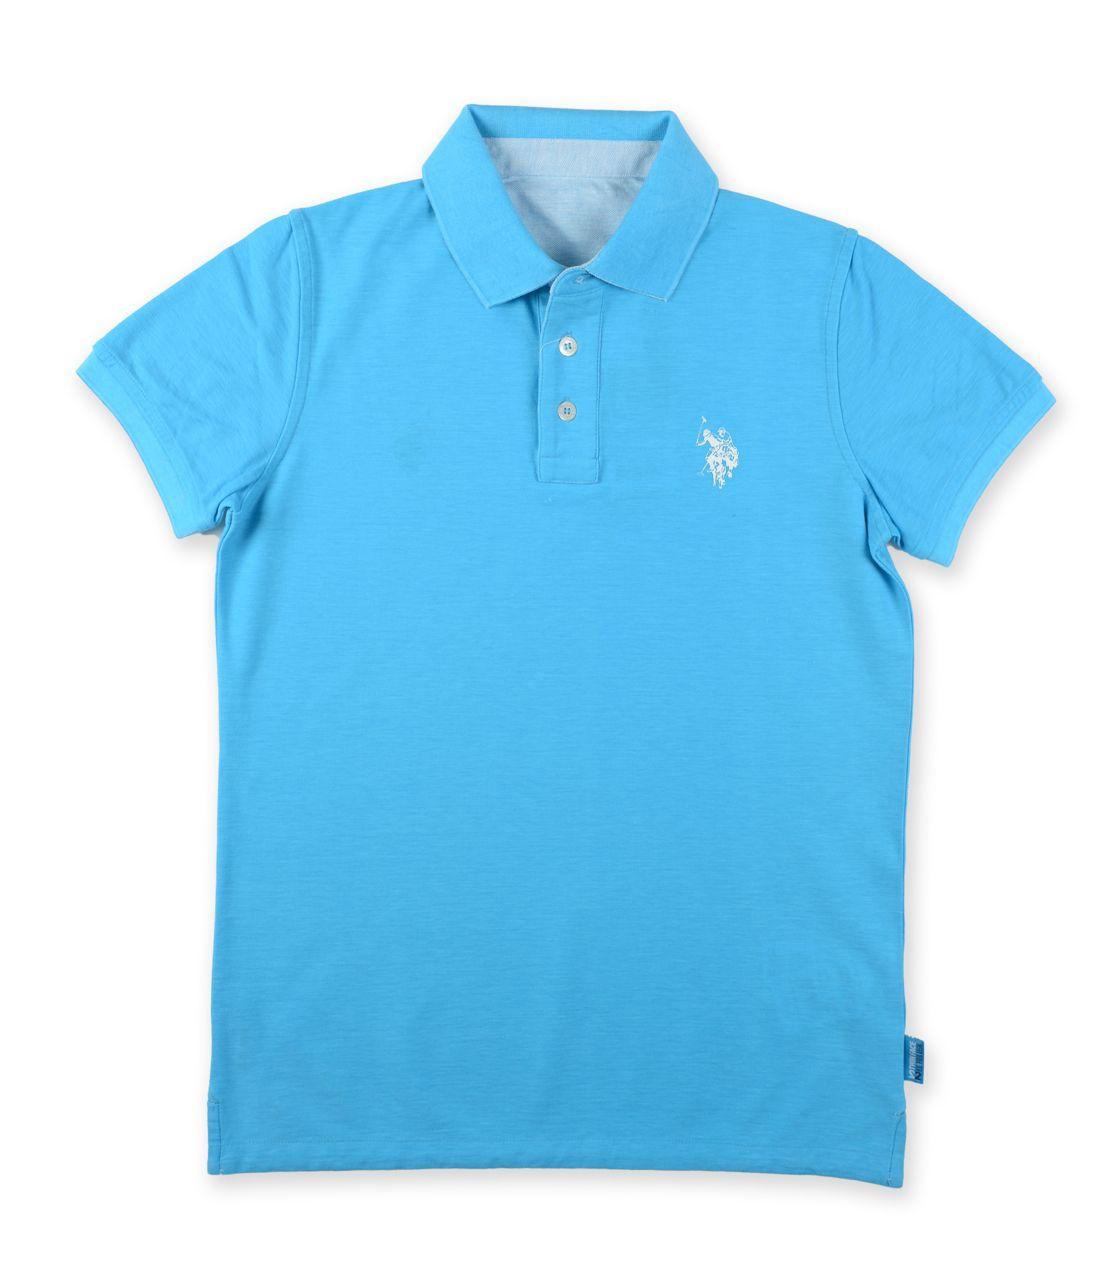 U S Polo Assn Poloshirt Reverso Wendepolo Turkis Weiss